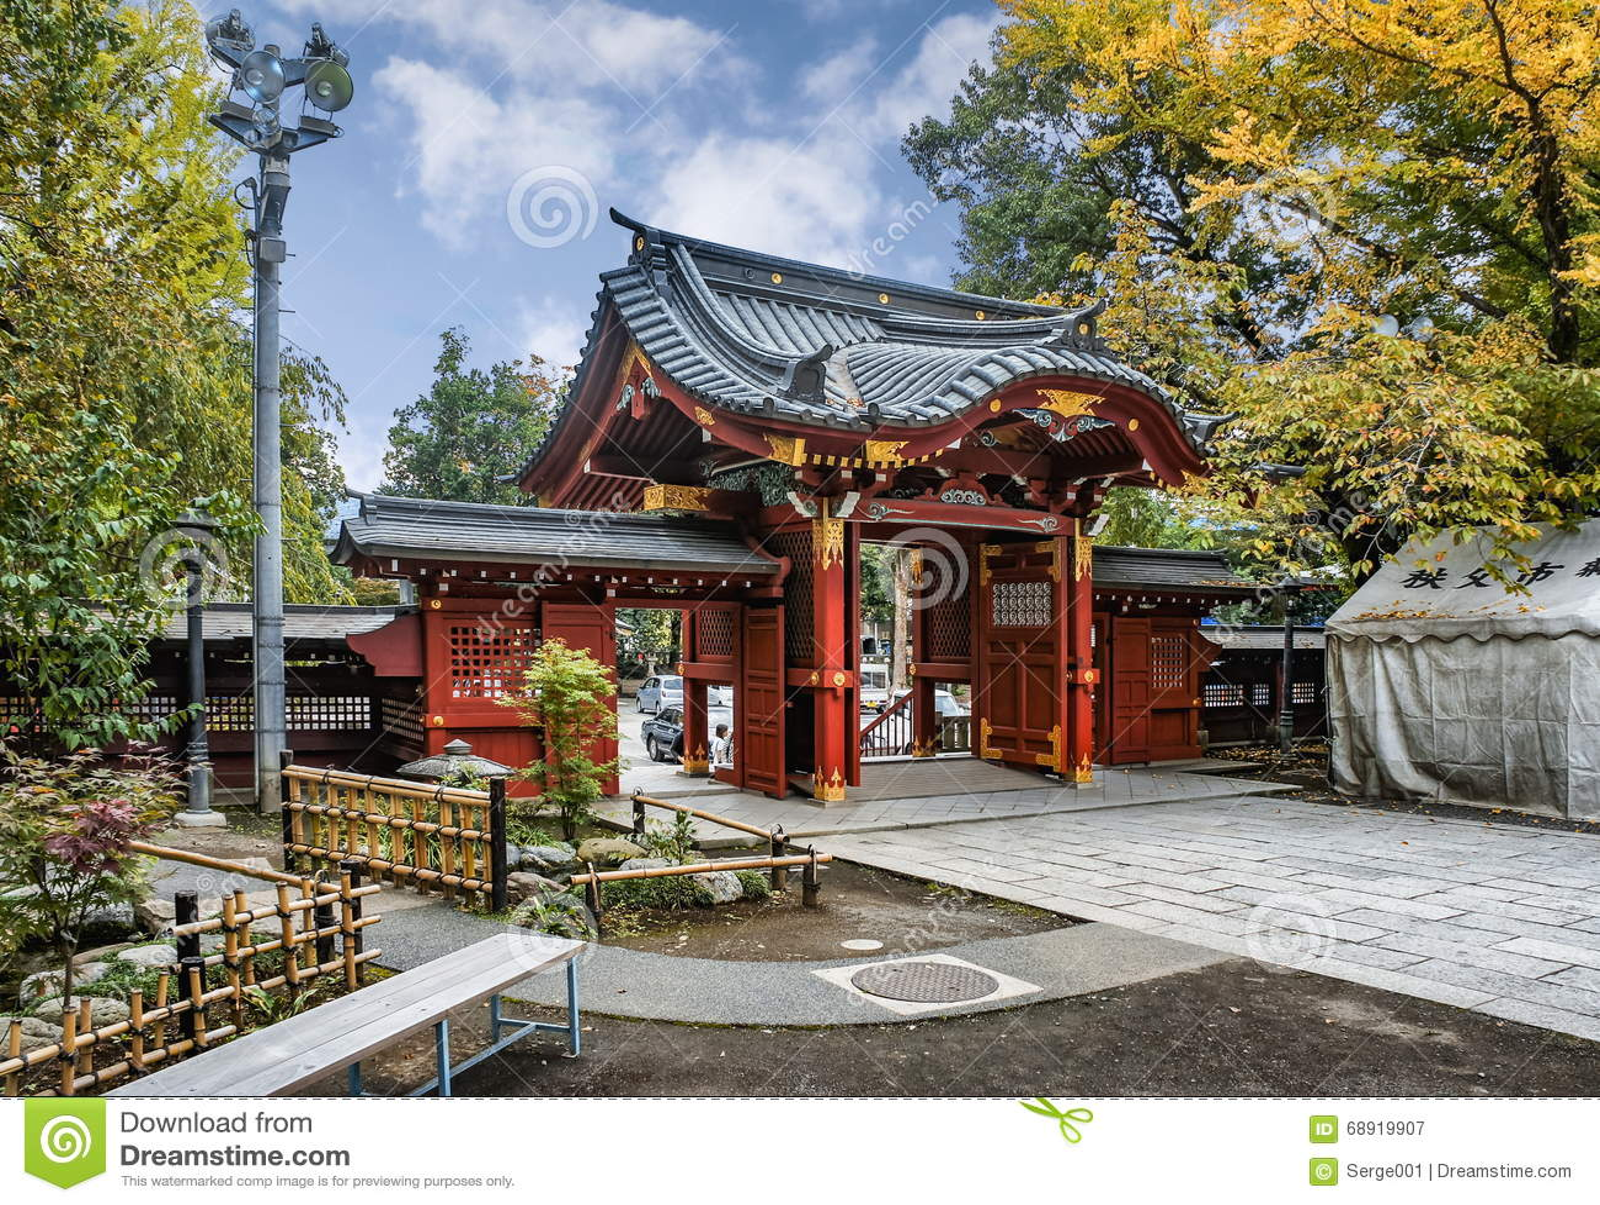 Chichibu Japan  city images : gate to Chichibu Shrine, Chichibu, Saitama prefecture, Japan. Chichibu ...